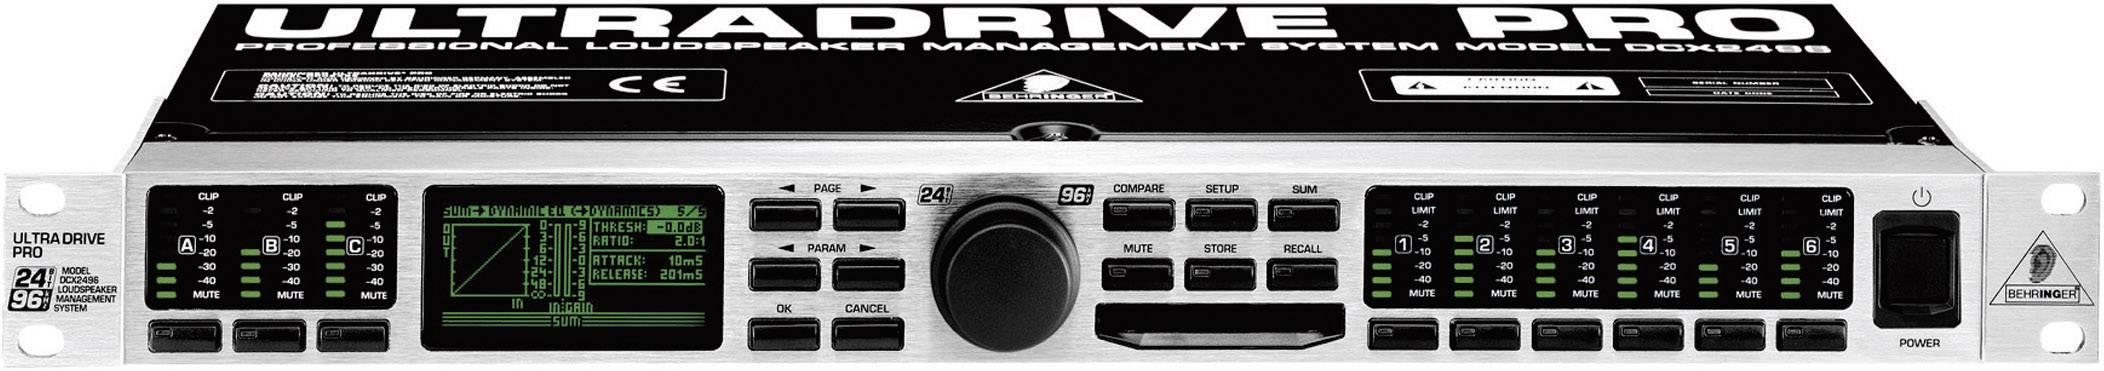 Frekvenční výhybka Behringer DCX2496